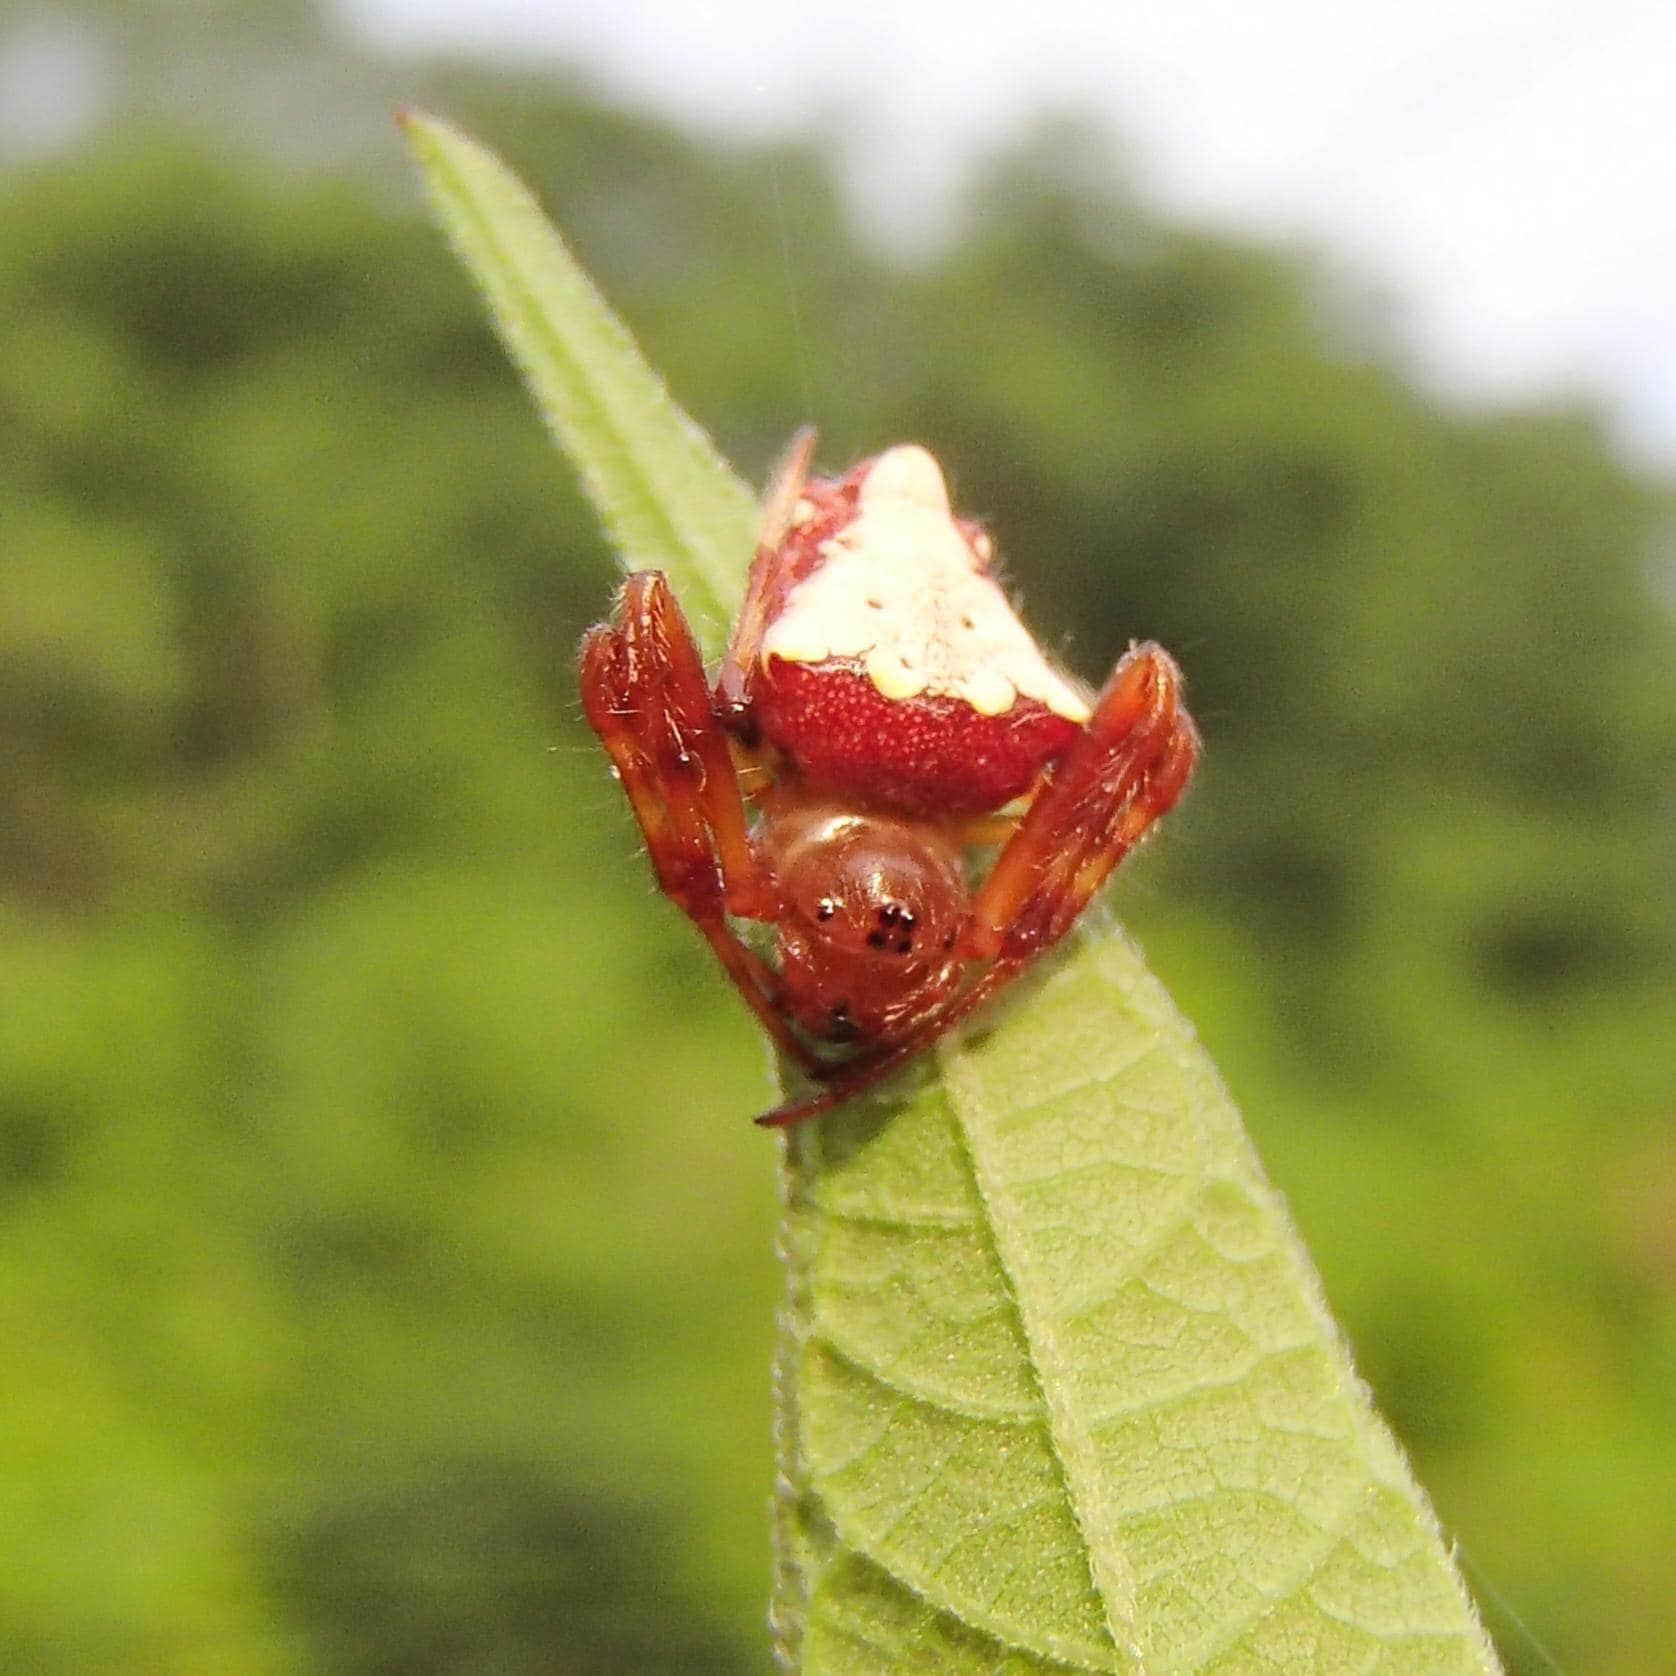 Picture of Verrucosa arenata (Arrowhead Orb-weaver) - Female - Dorsal,Eyes